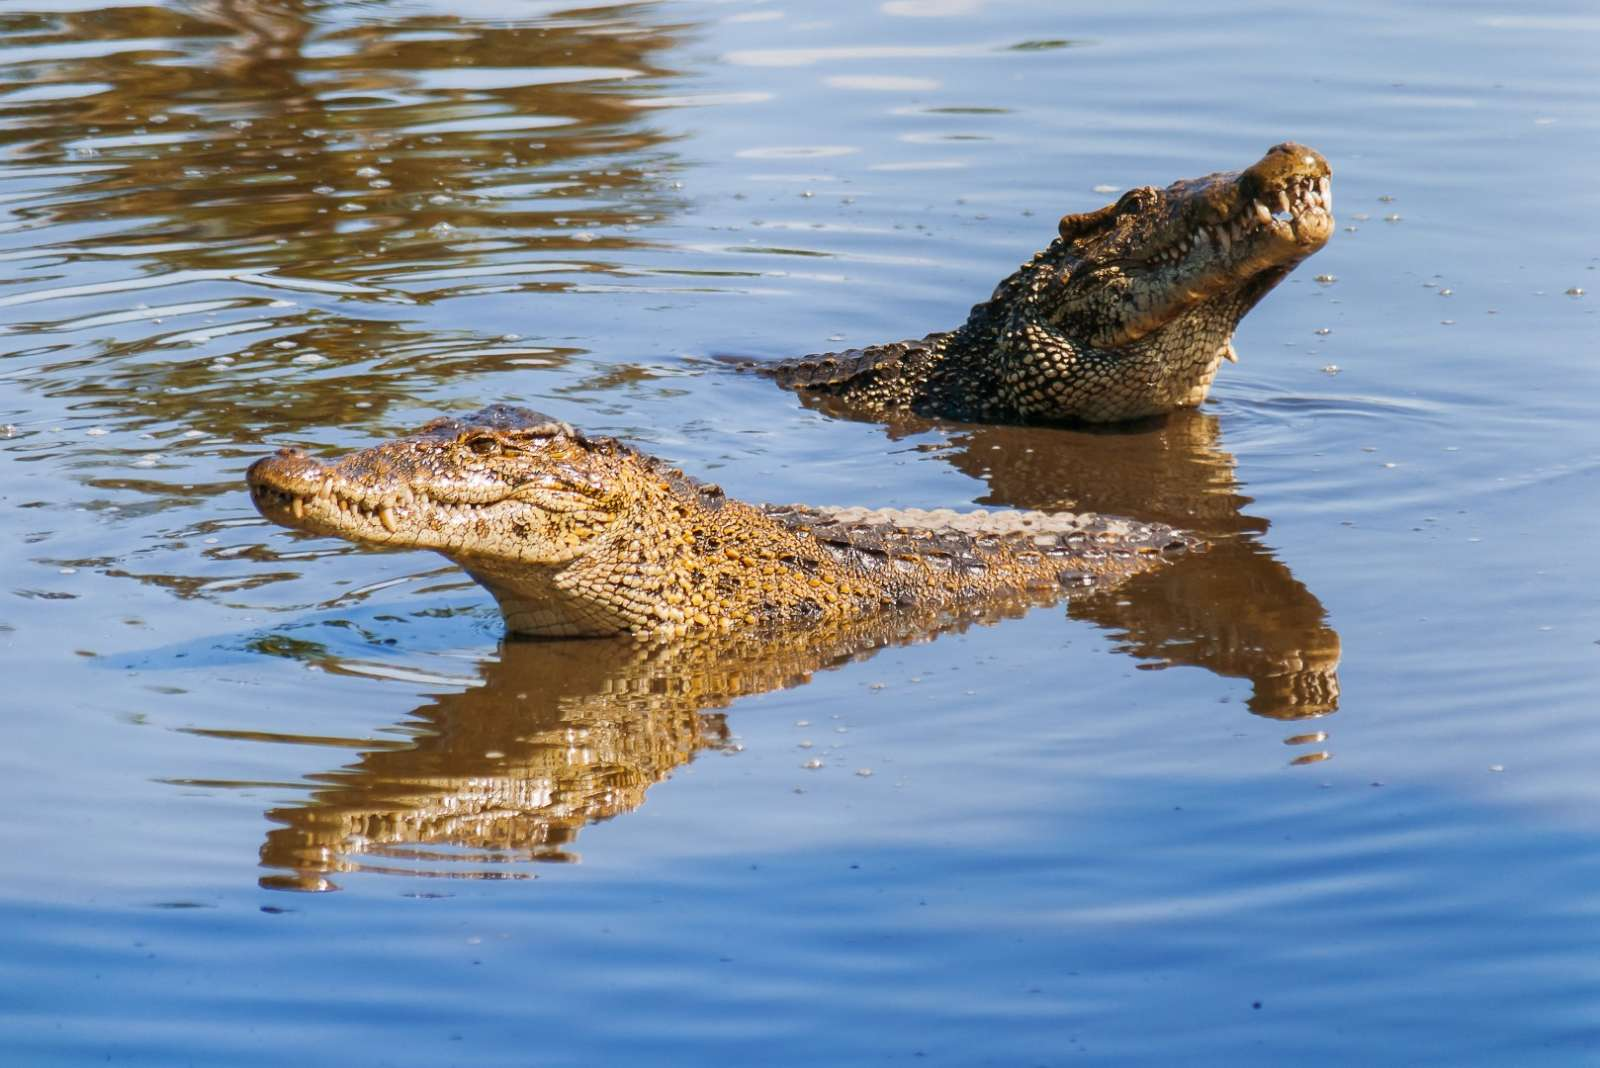 Cuban crocodiles in the Zapata Peninsula, Cuba